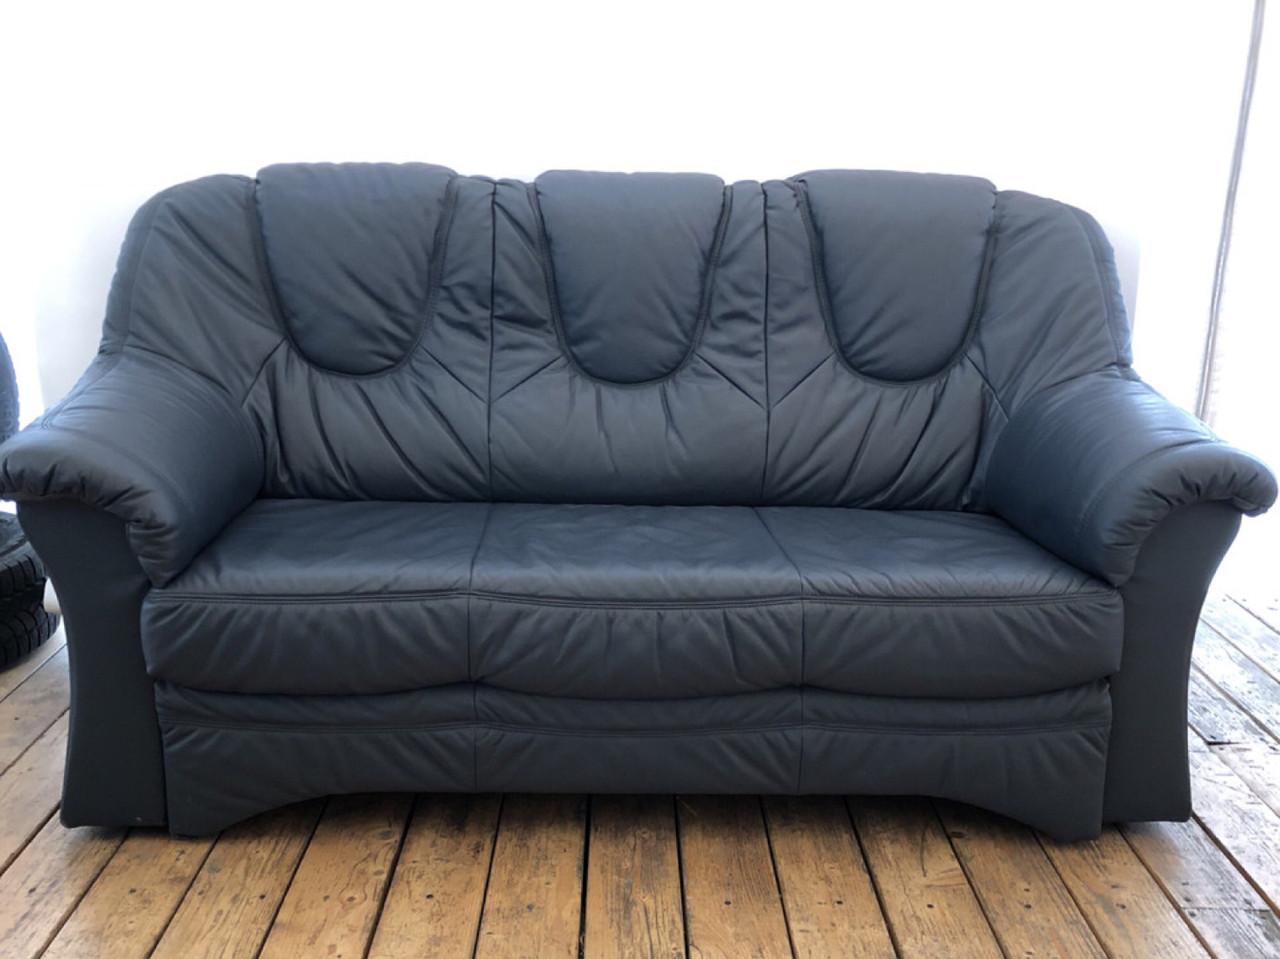 Кожаный Диван раскладной шкіряний диван «Монклер»